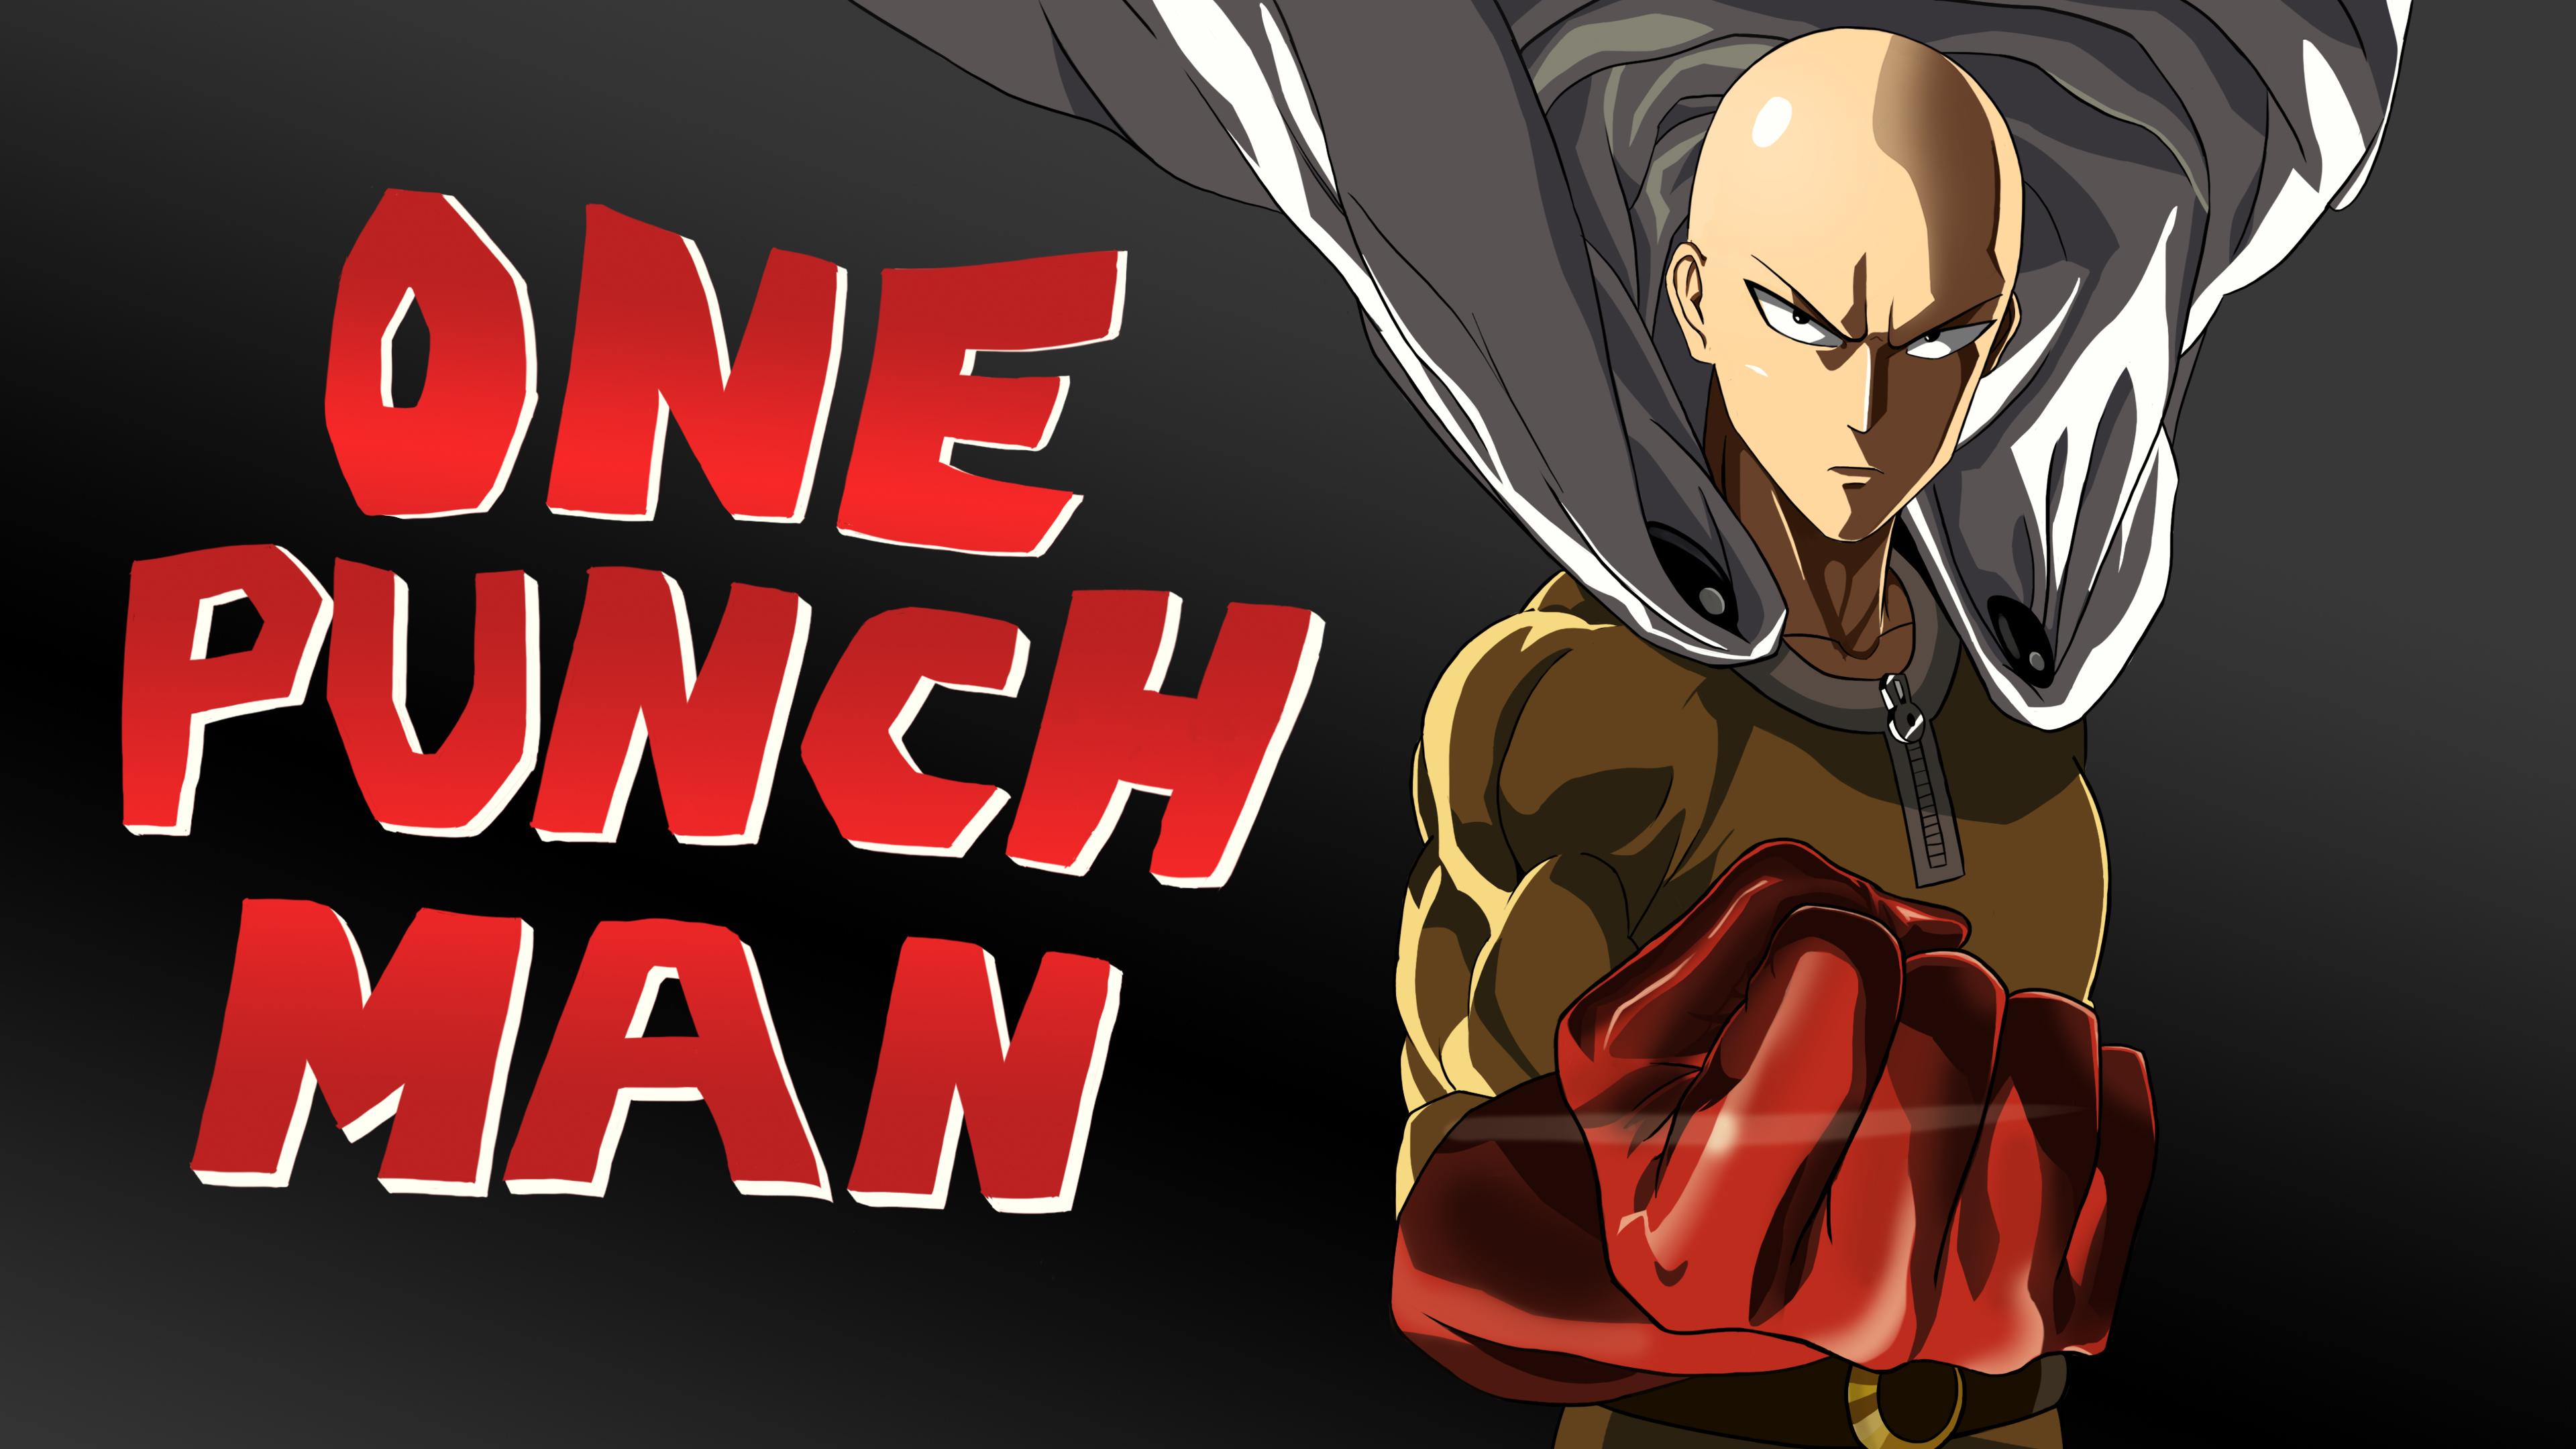 Wallpaper Anime Boys White Skin One Punch Man Artwork Saitama